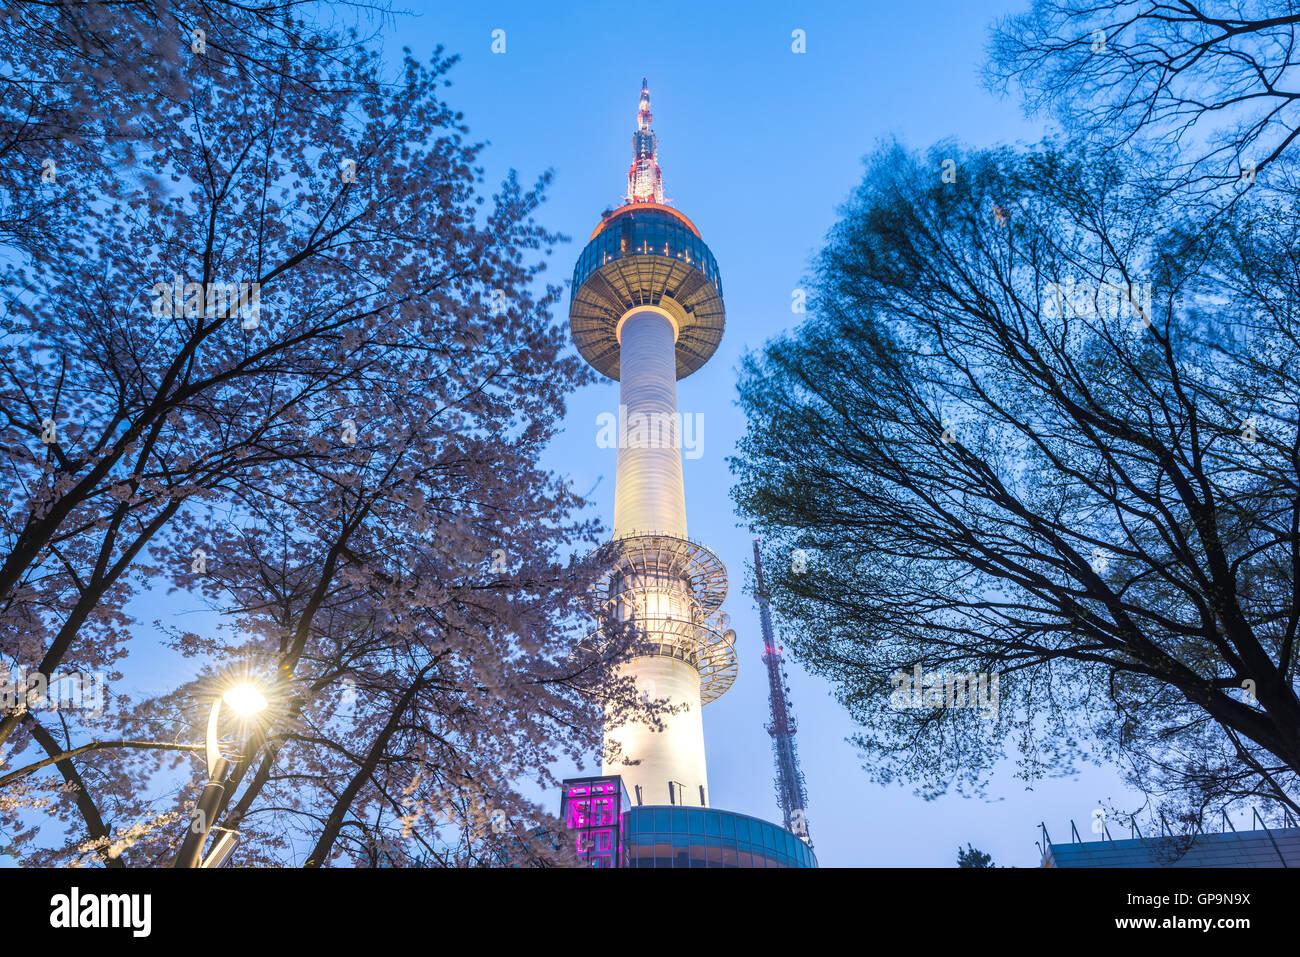 Seoul tower at night in Seoul,South Korea - Stock Image